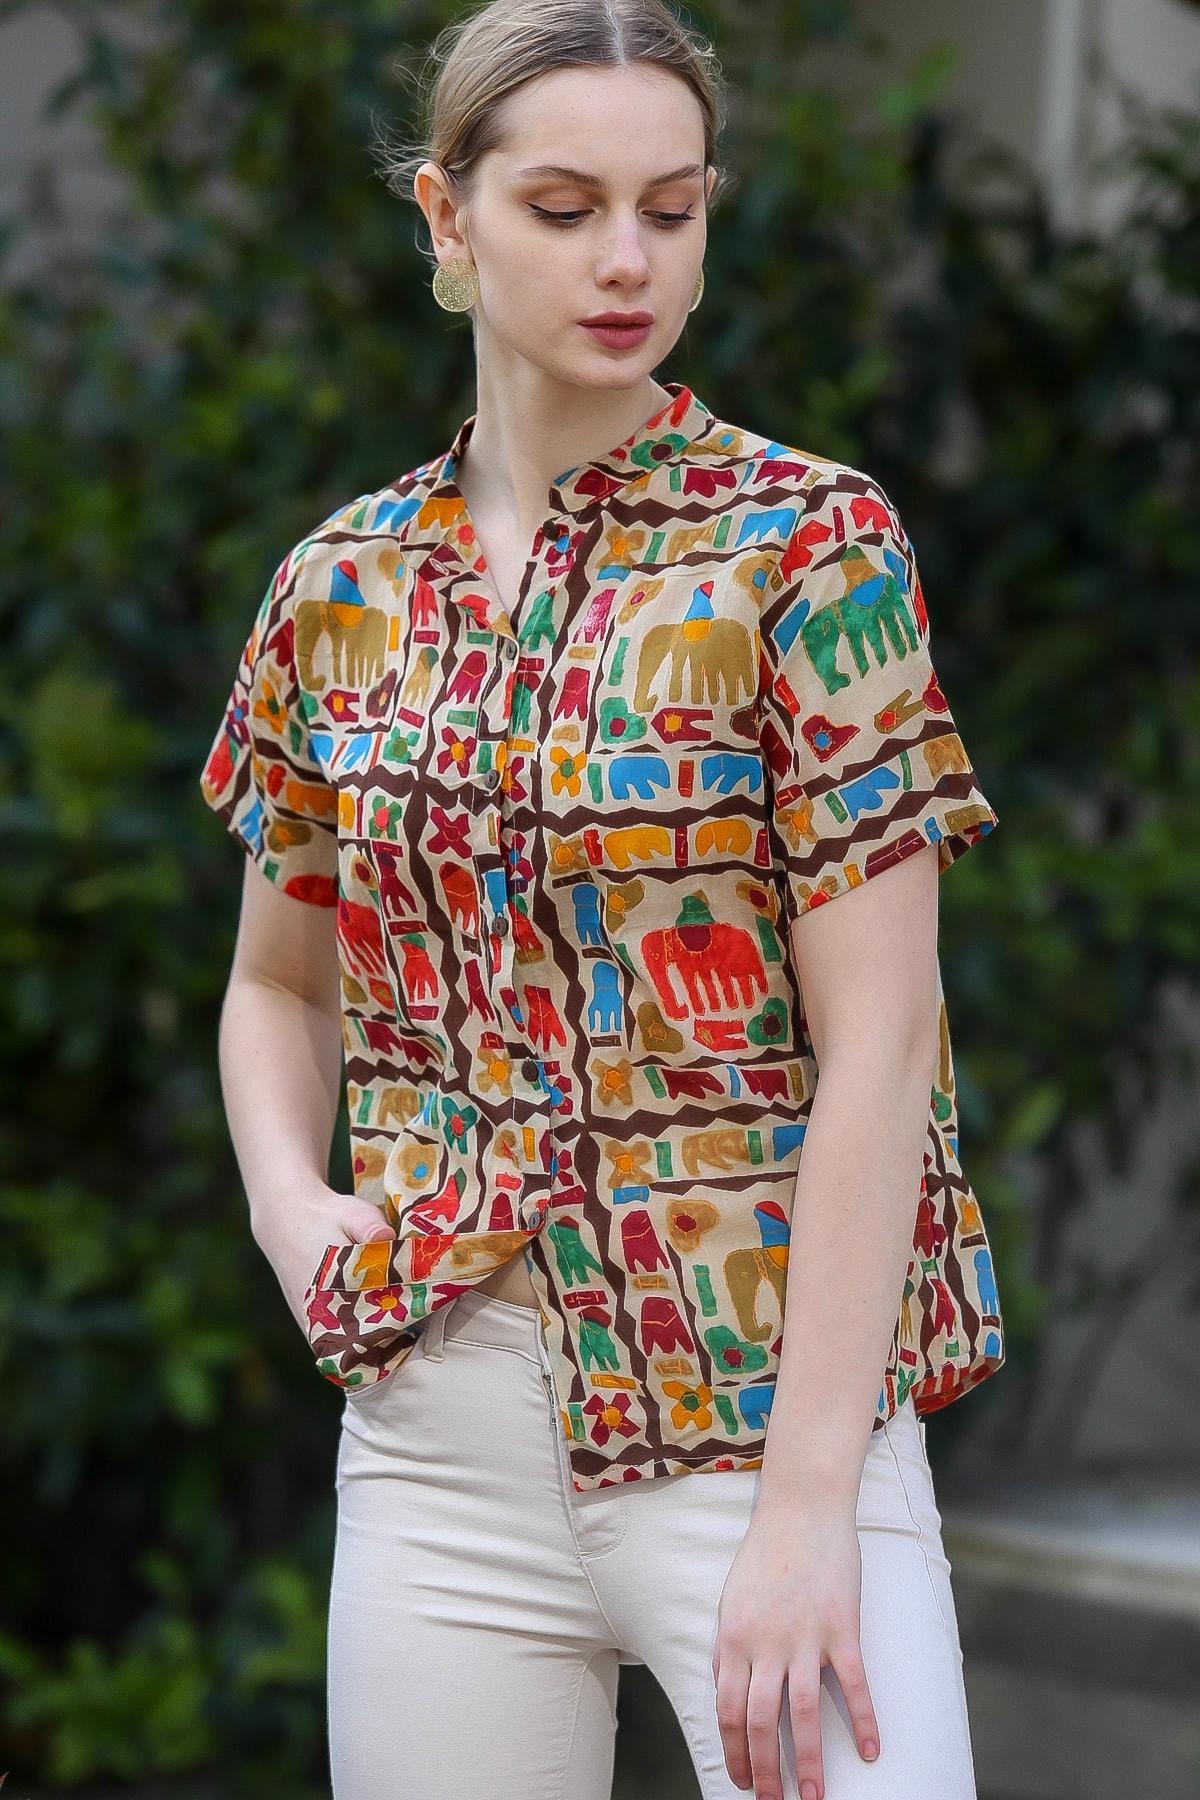 Chiccy Kadın Bej Yakasız Düğme Detaylı Fil Desenli Dokuma Bluz M10010200BL95376